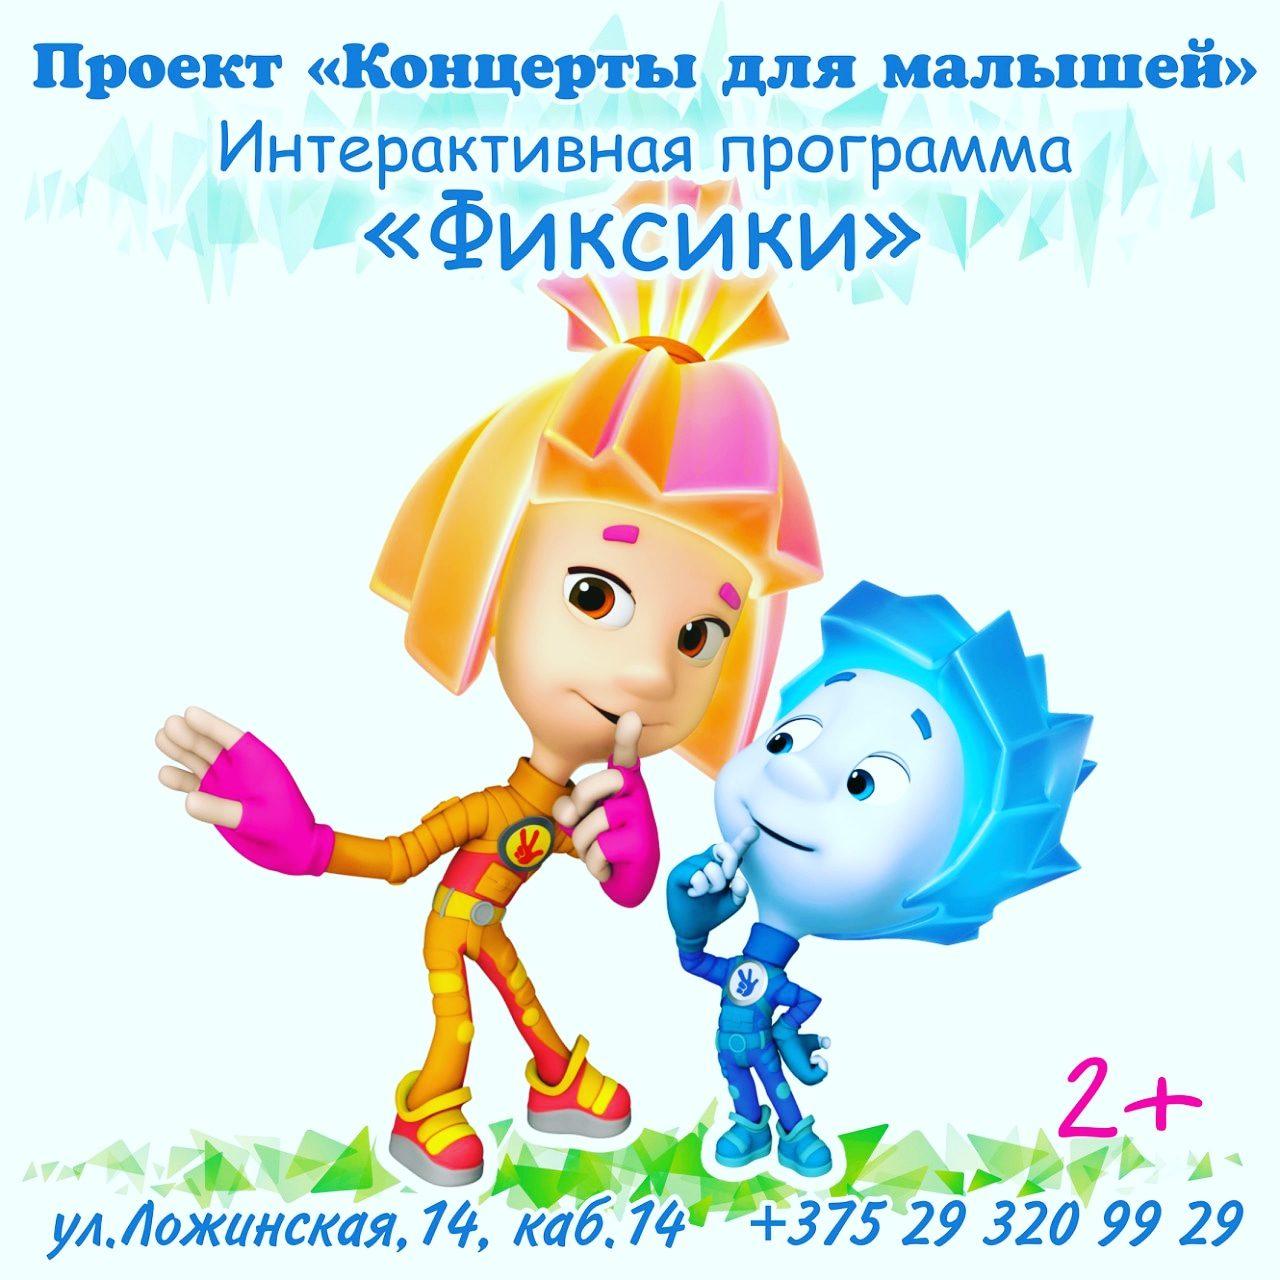 Афиша Интерактивная программа «Фиксики»